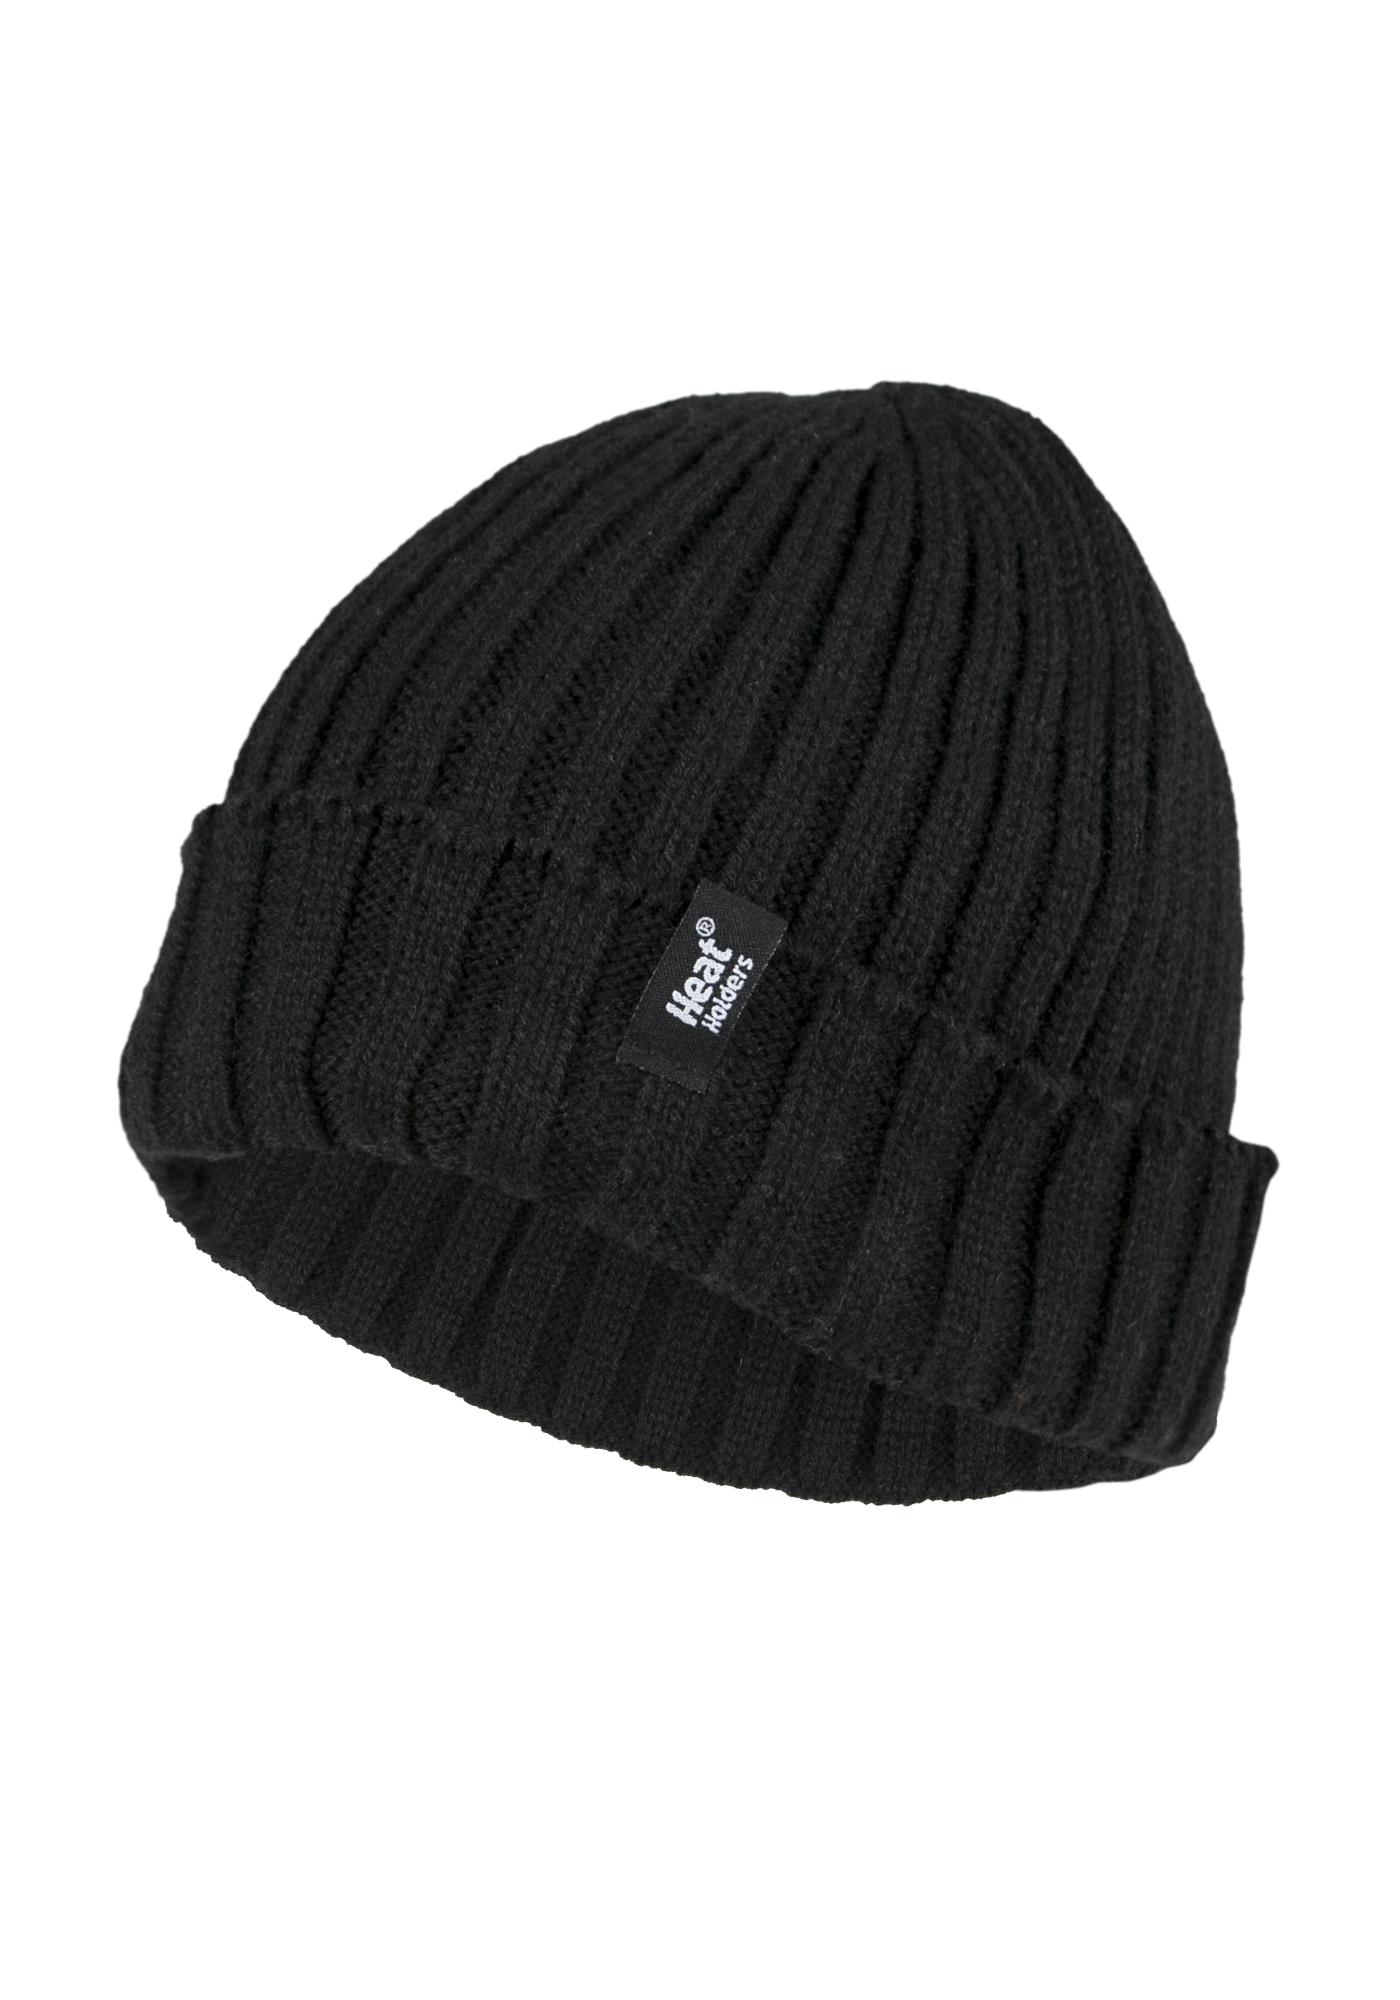 8d4ed4daa53 Men s Thermal Cuffed Hat